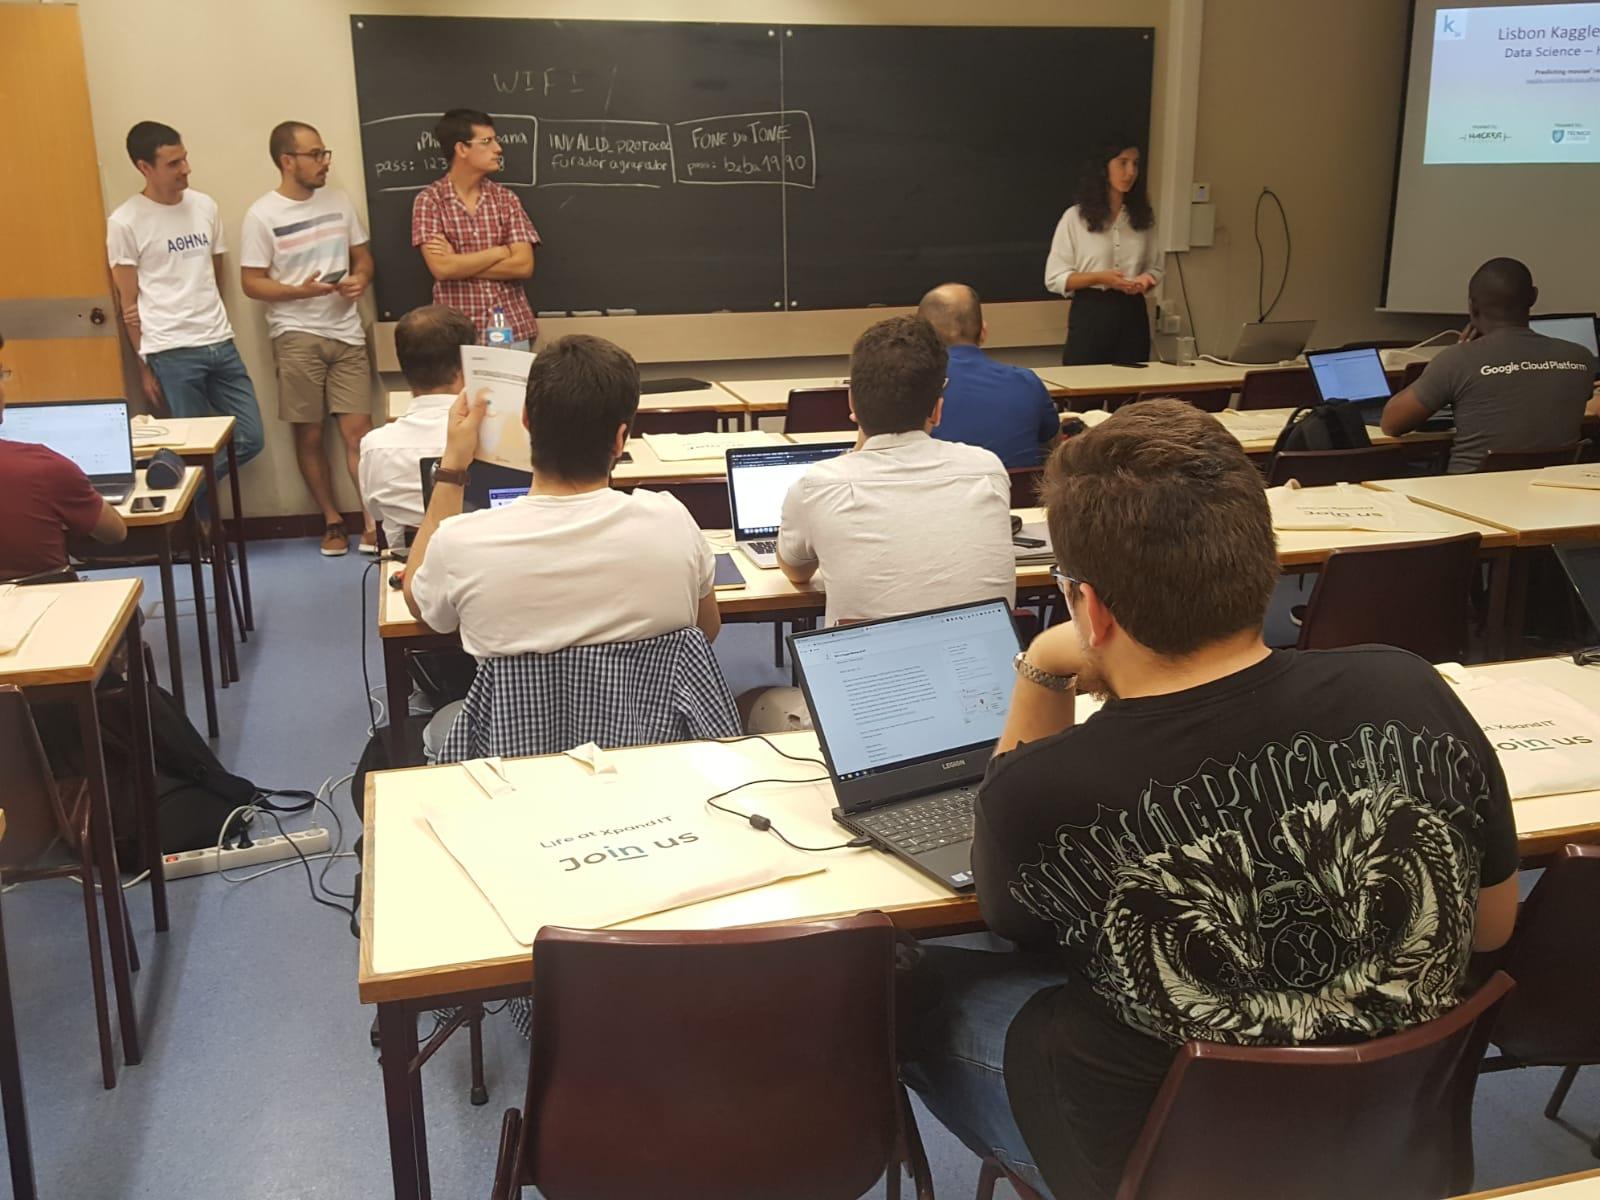 Data Science meetup